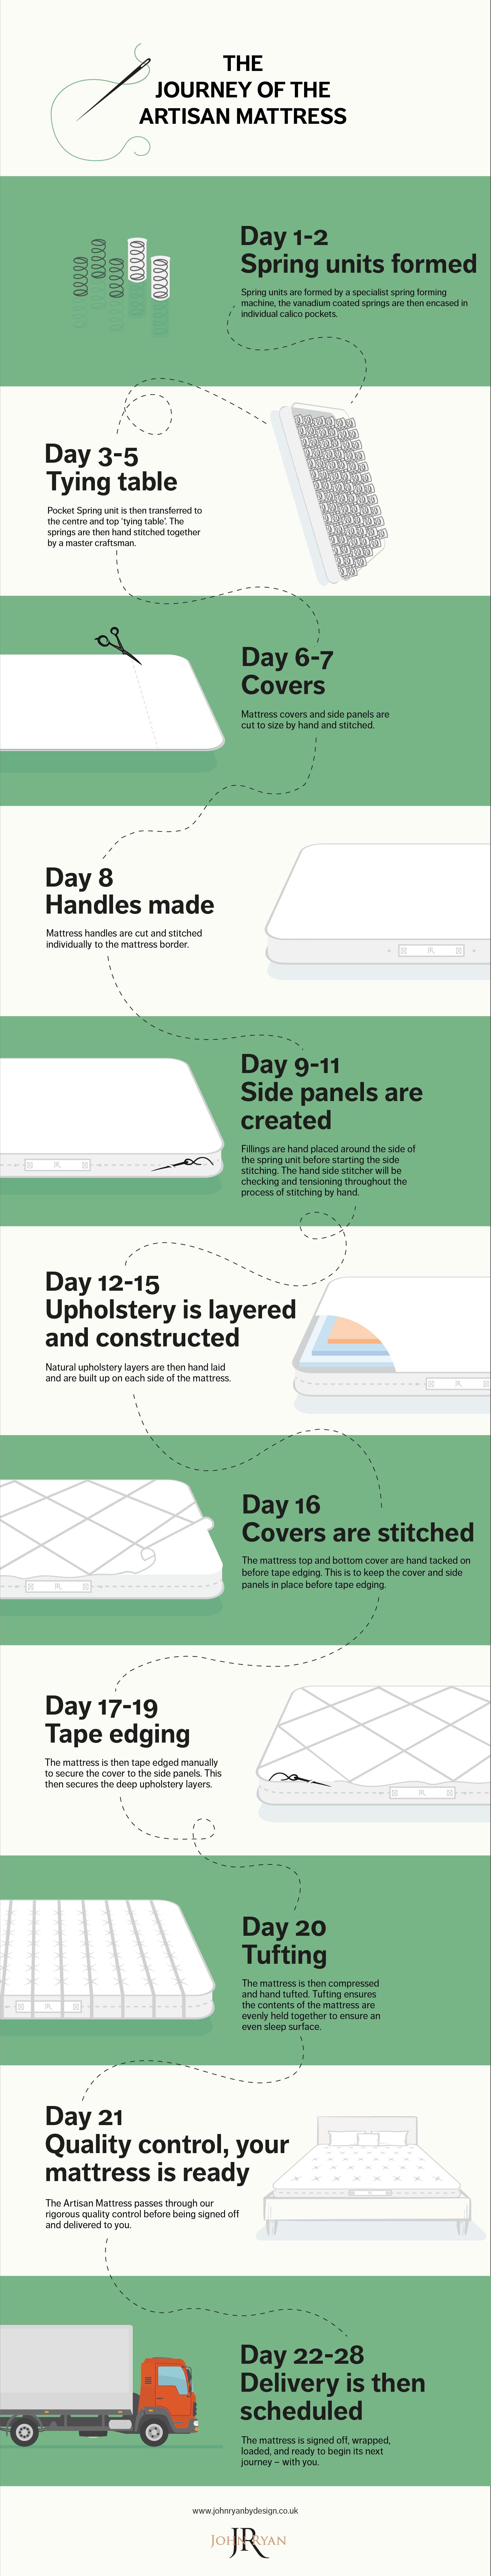 artisan mattress journey infographic